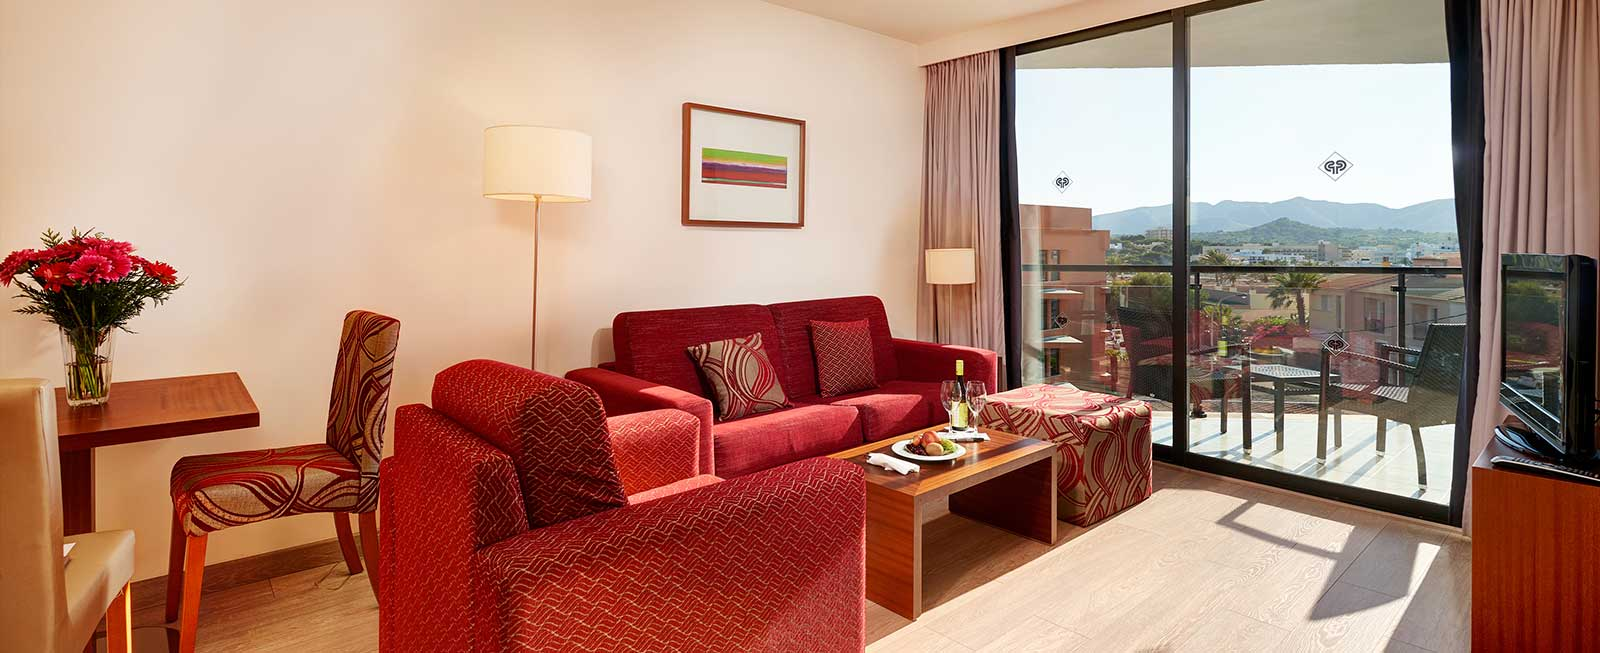 Protur Turo Pins Hotel Spa